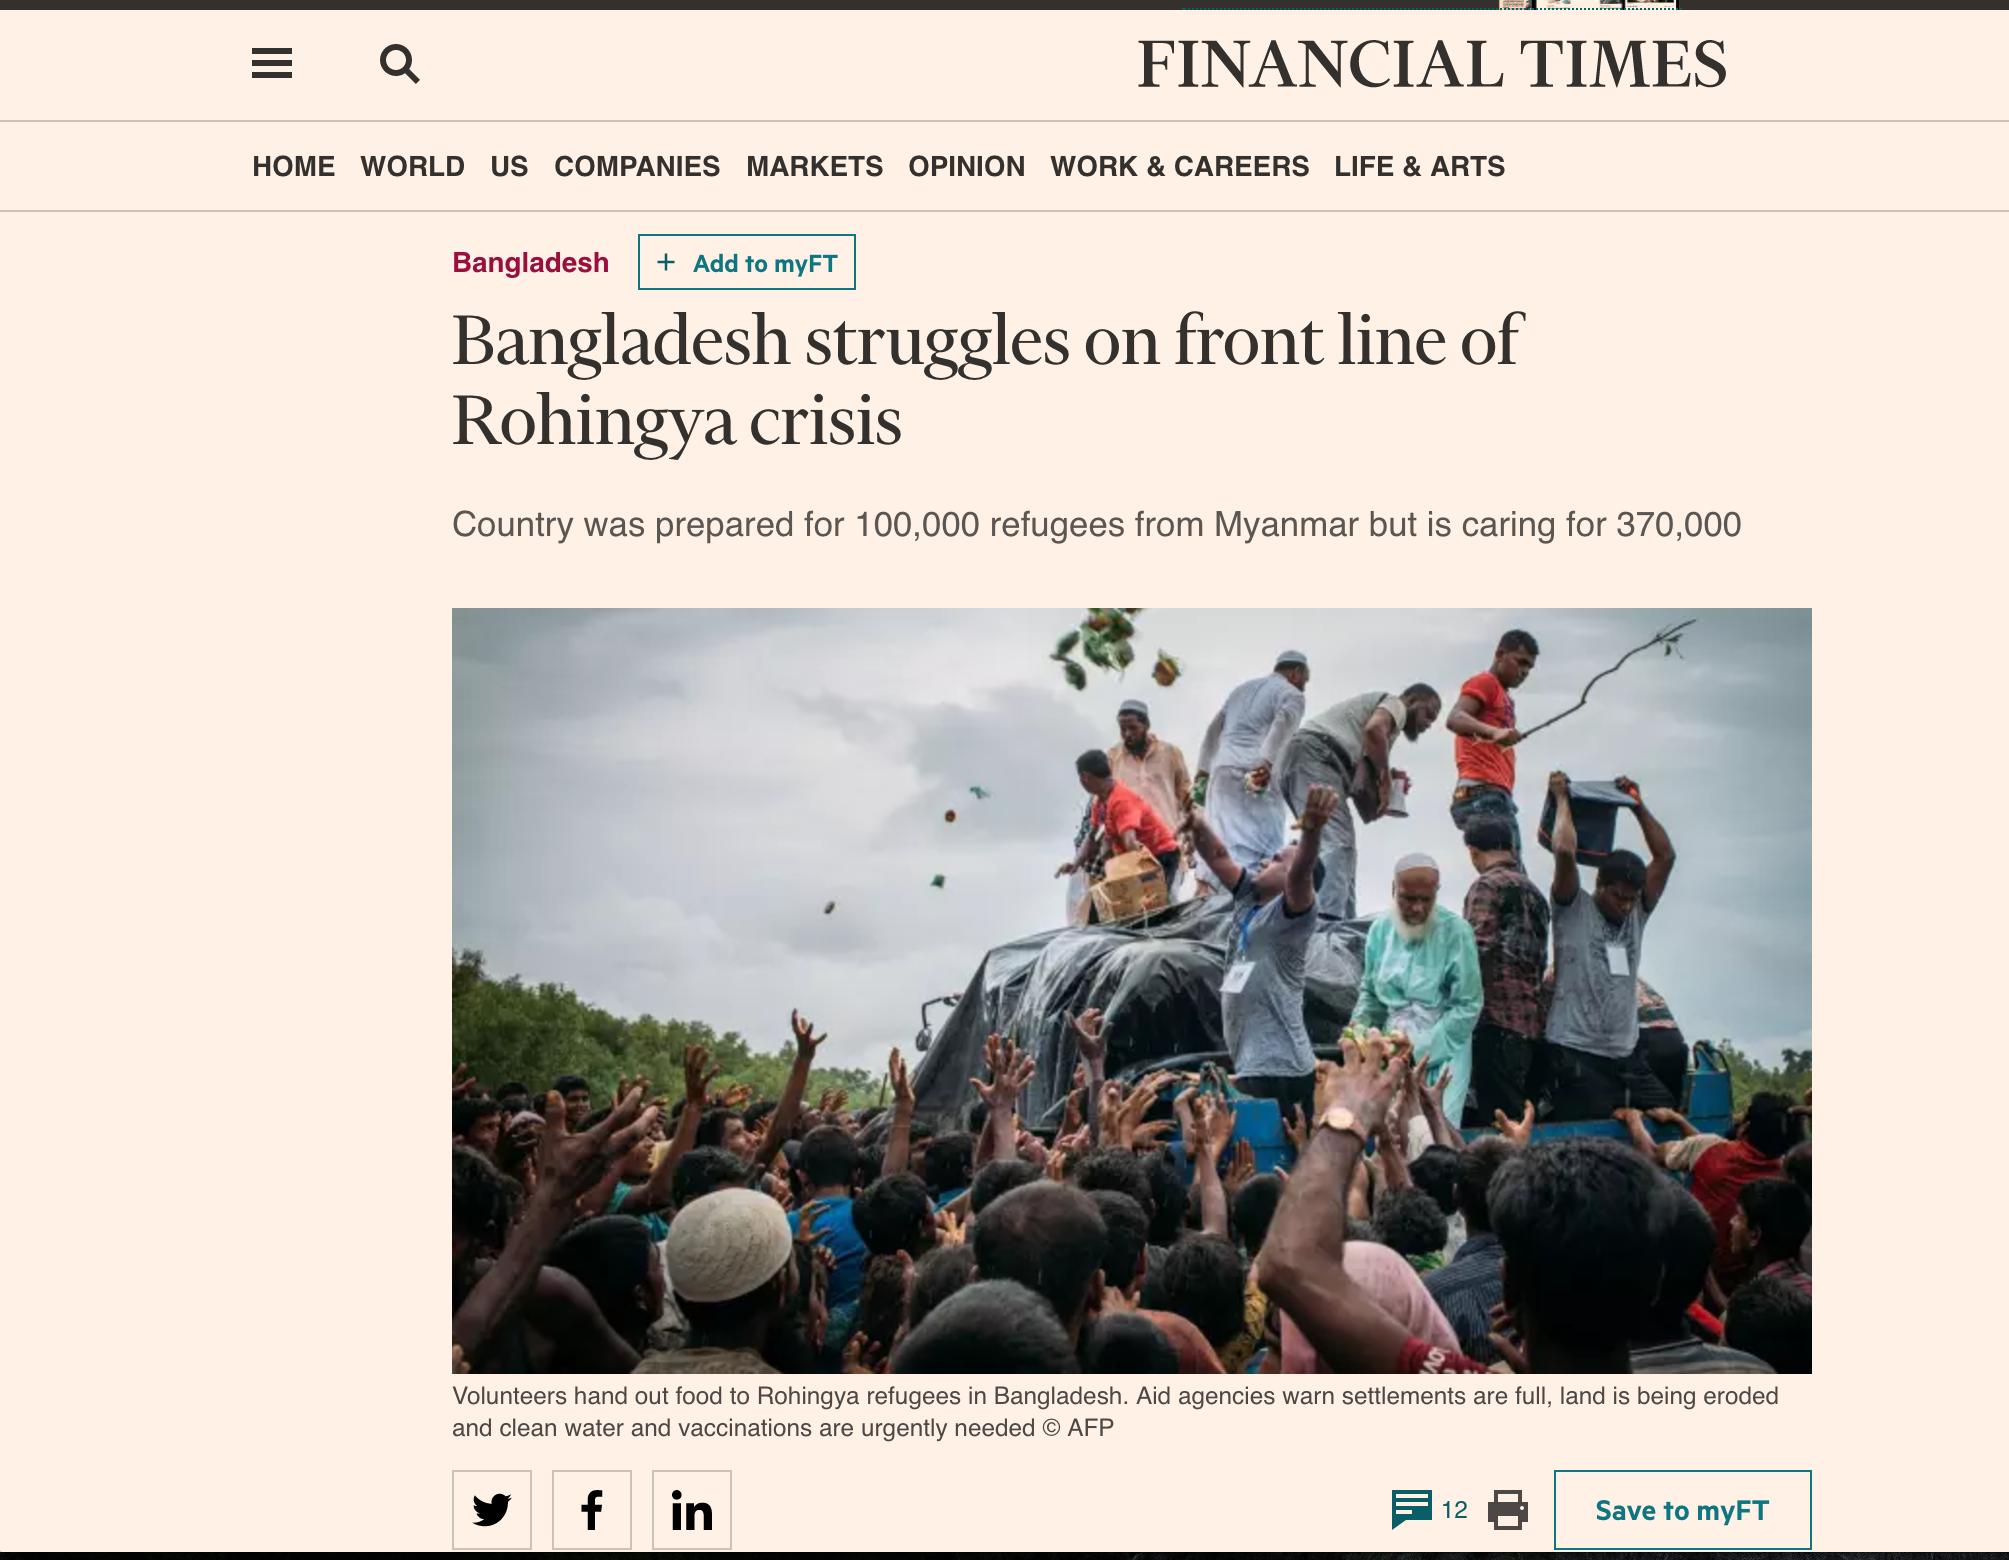 Financial Times, September 2017